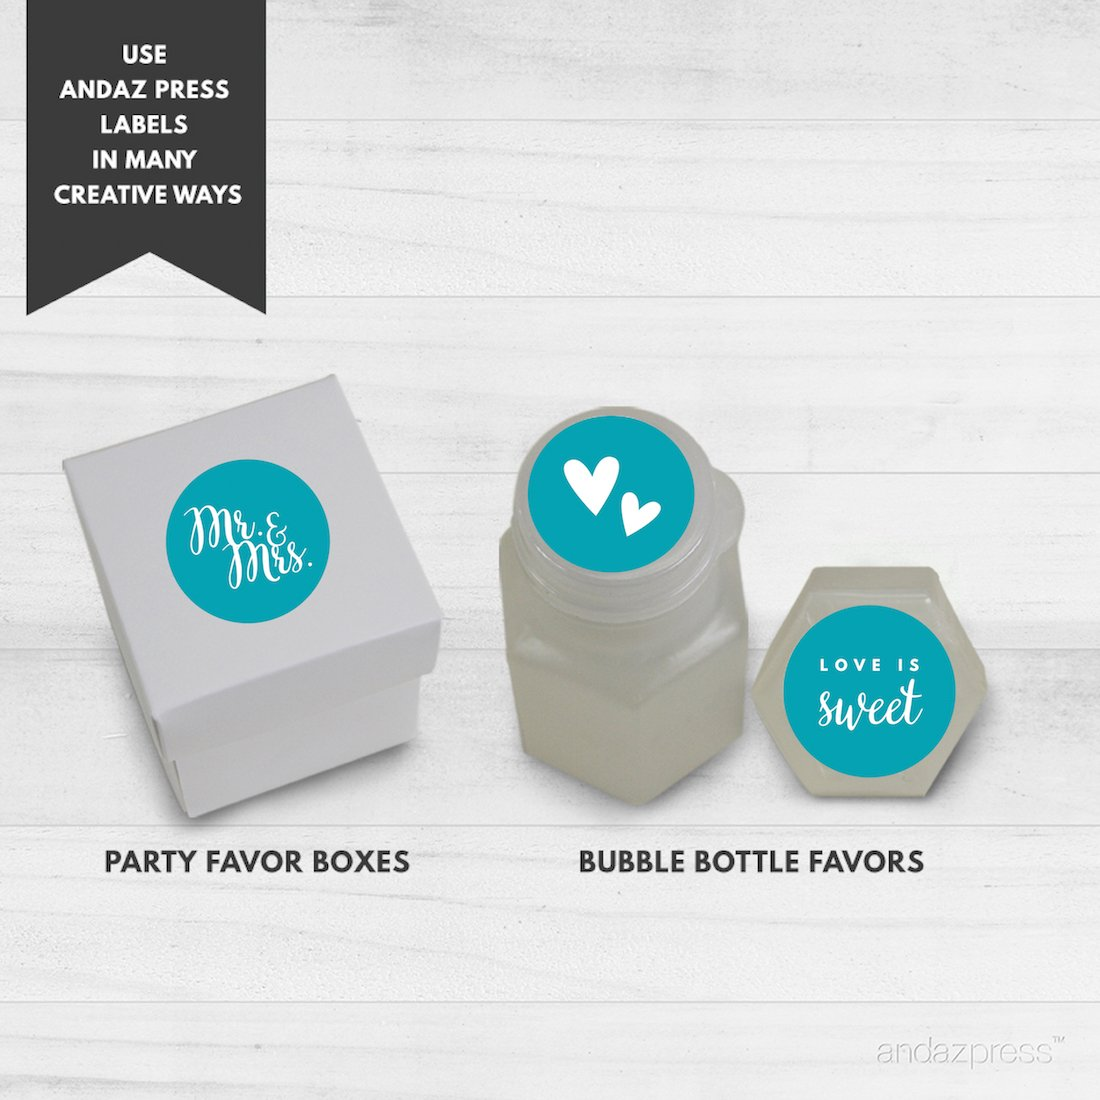 Amazon.com: Andaz Press Chocolate Drop Labels Trio, Fits Hershey\'s ...